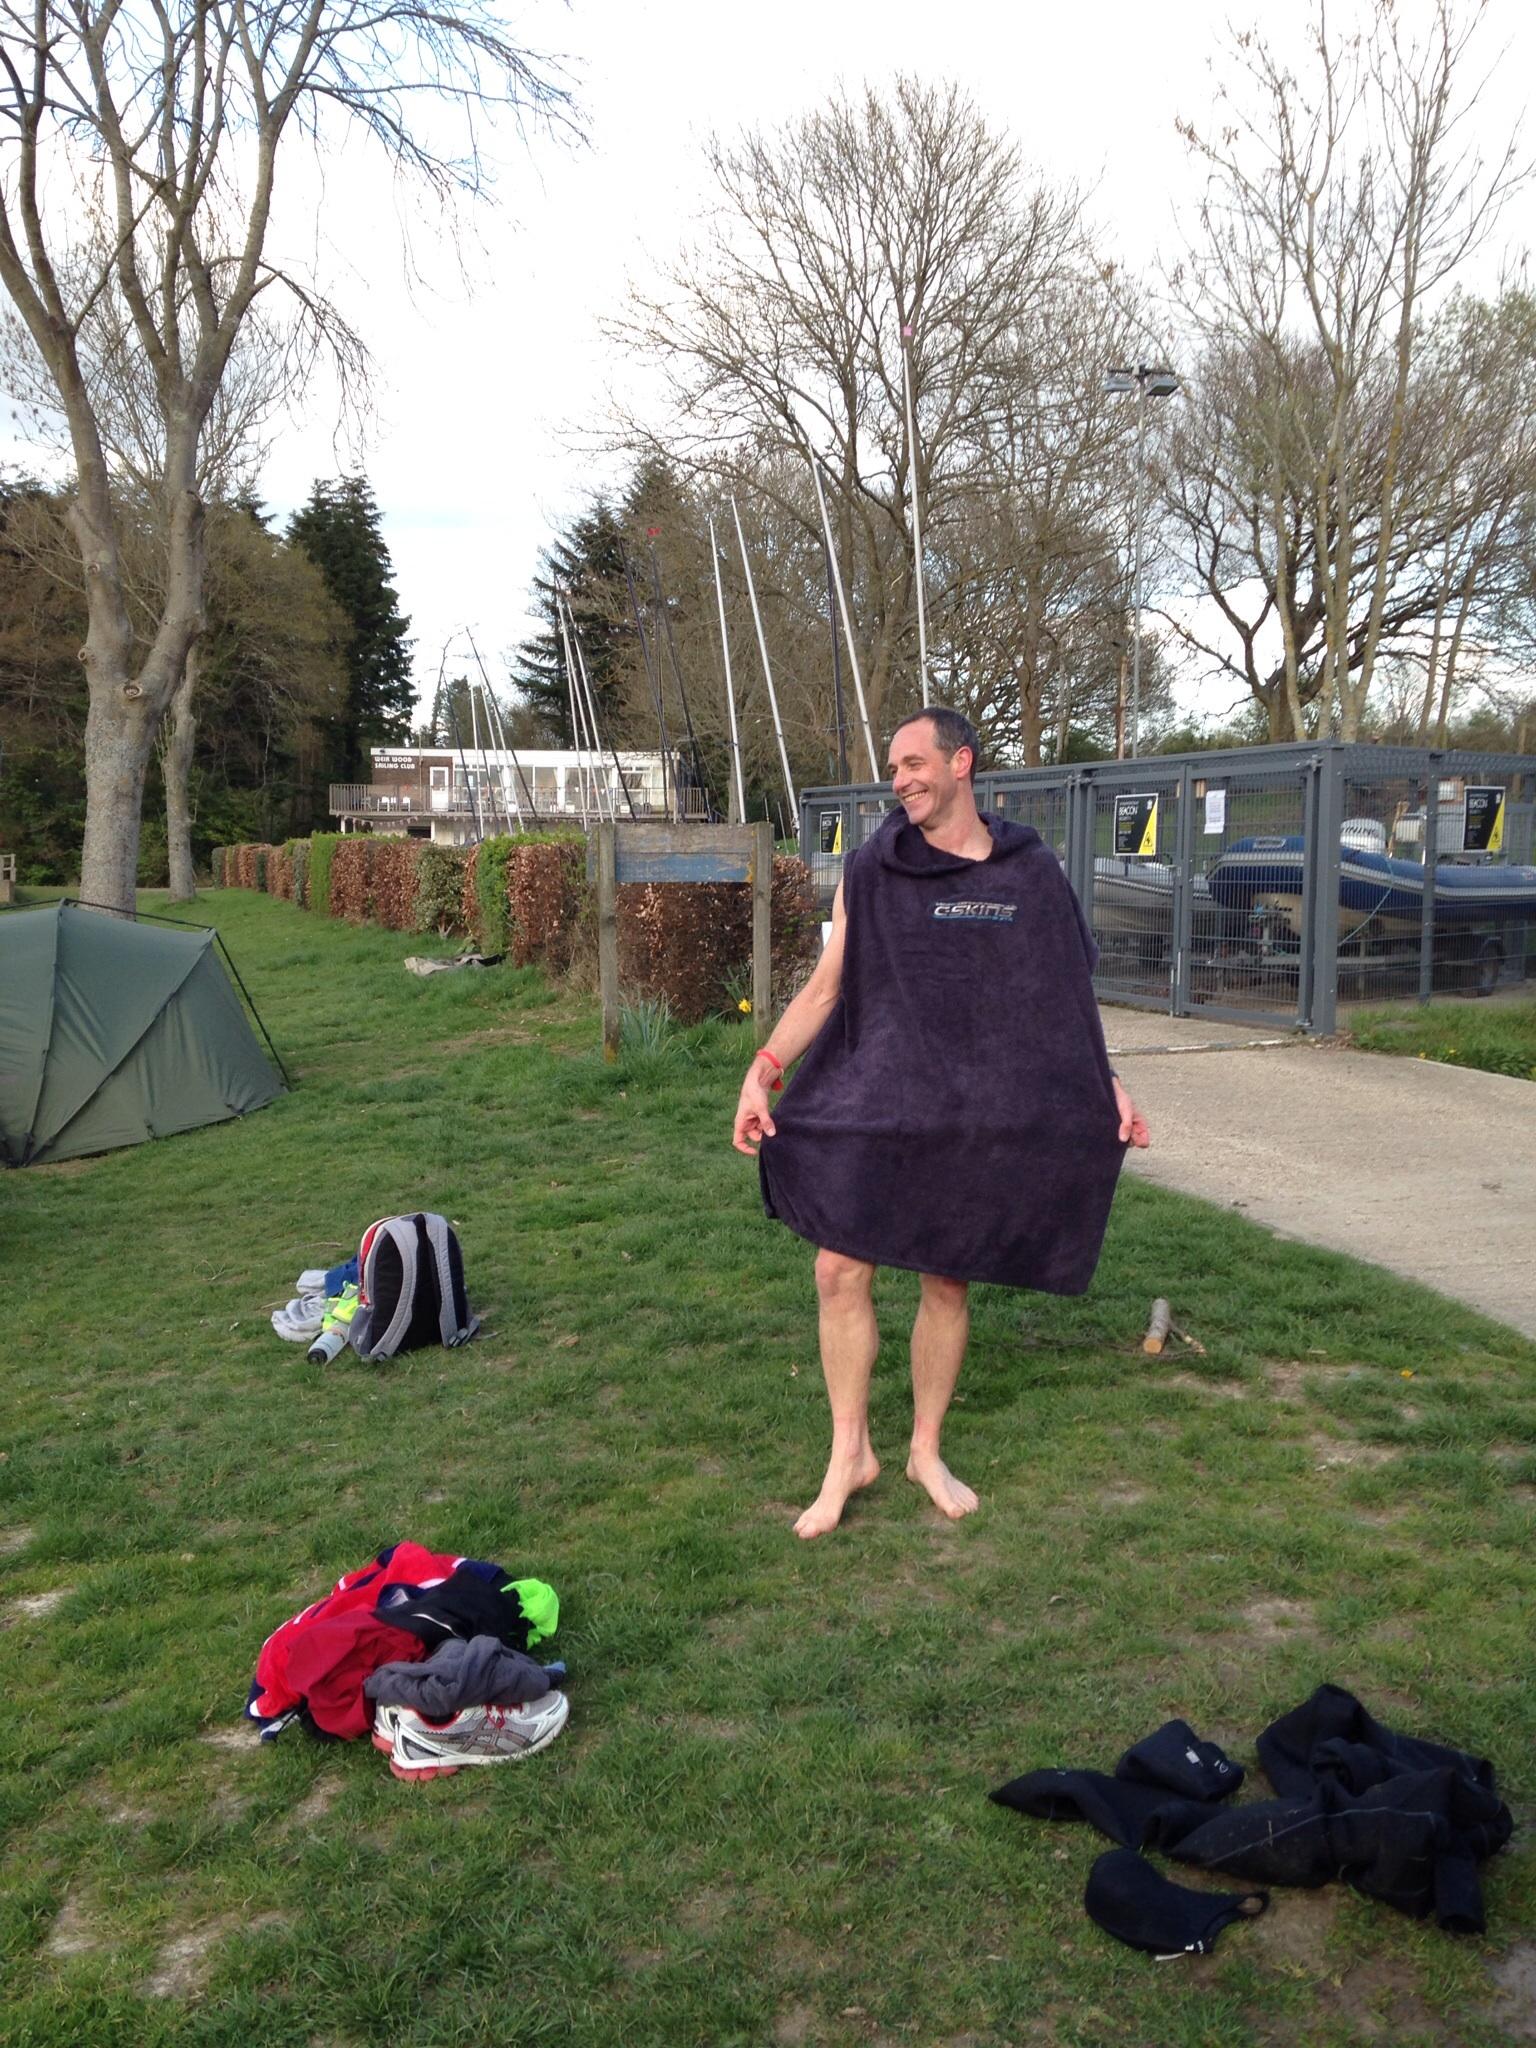 Kevins new wardrobe